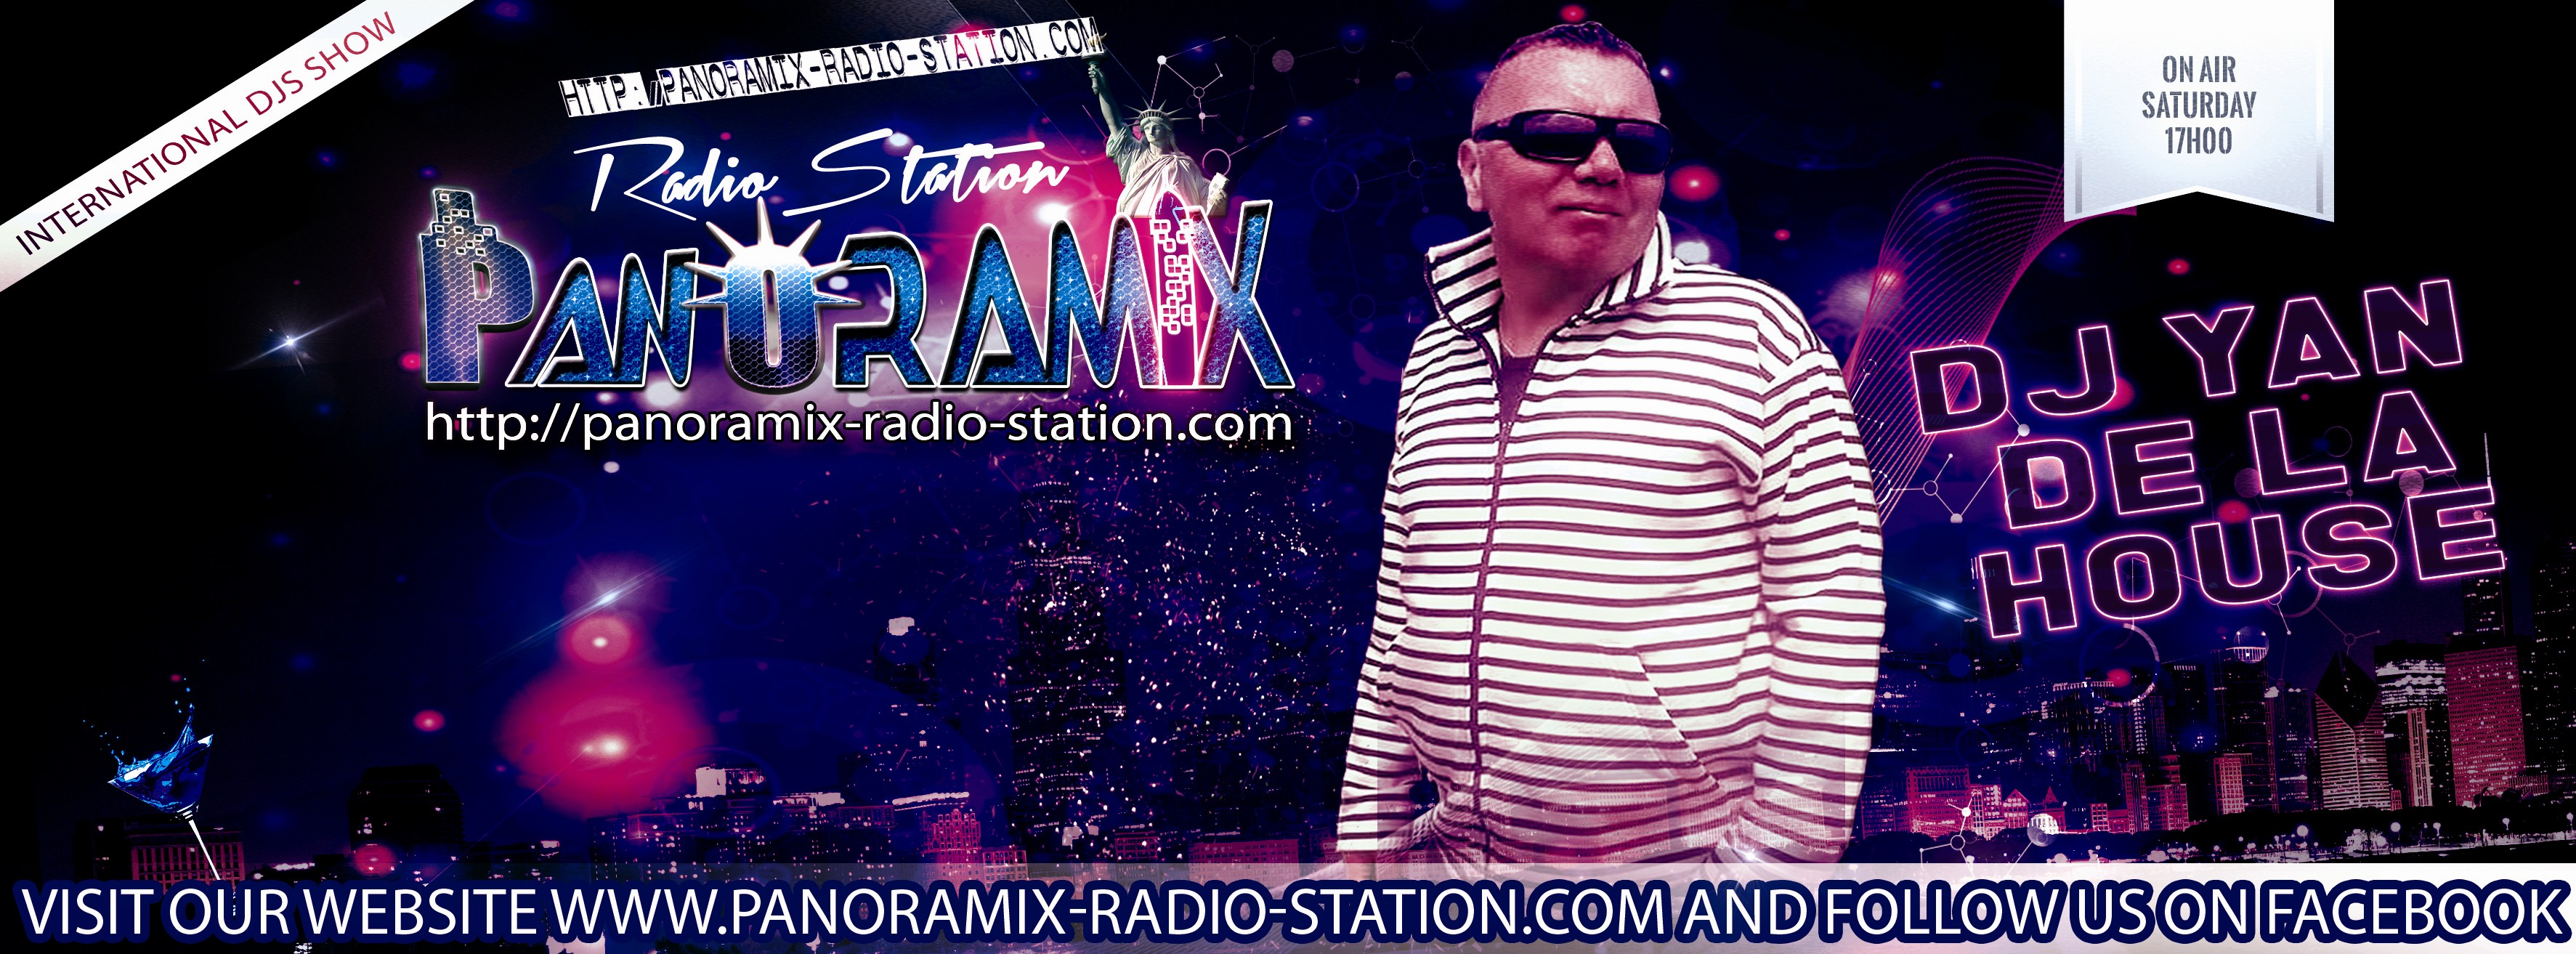 http://panoramix-radio-station.com/wp-content/uploads/2018/07/BANNIERE-site-DJ-YAN-HOUSE-panoramix-.jpg